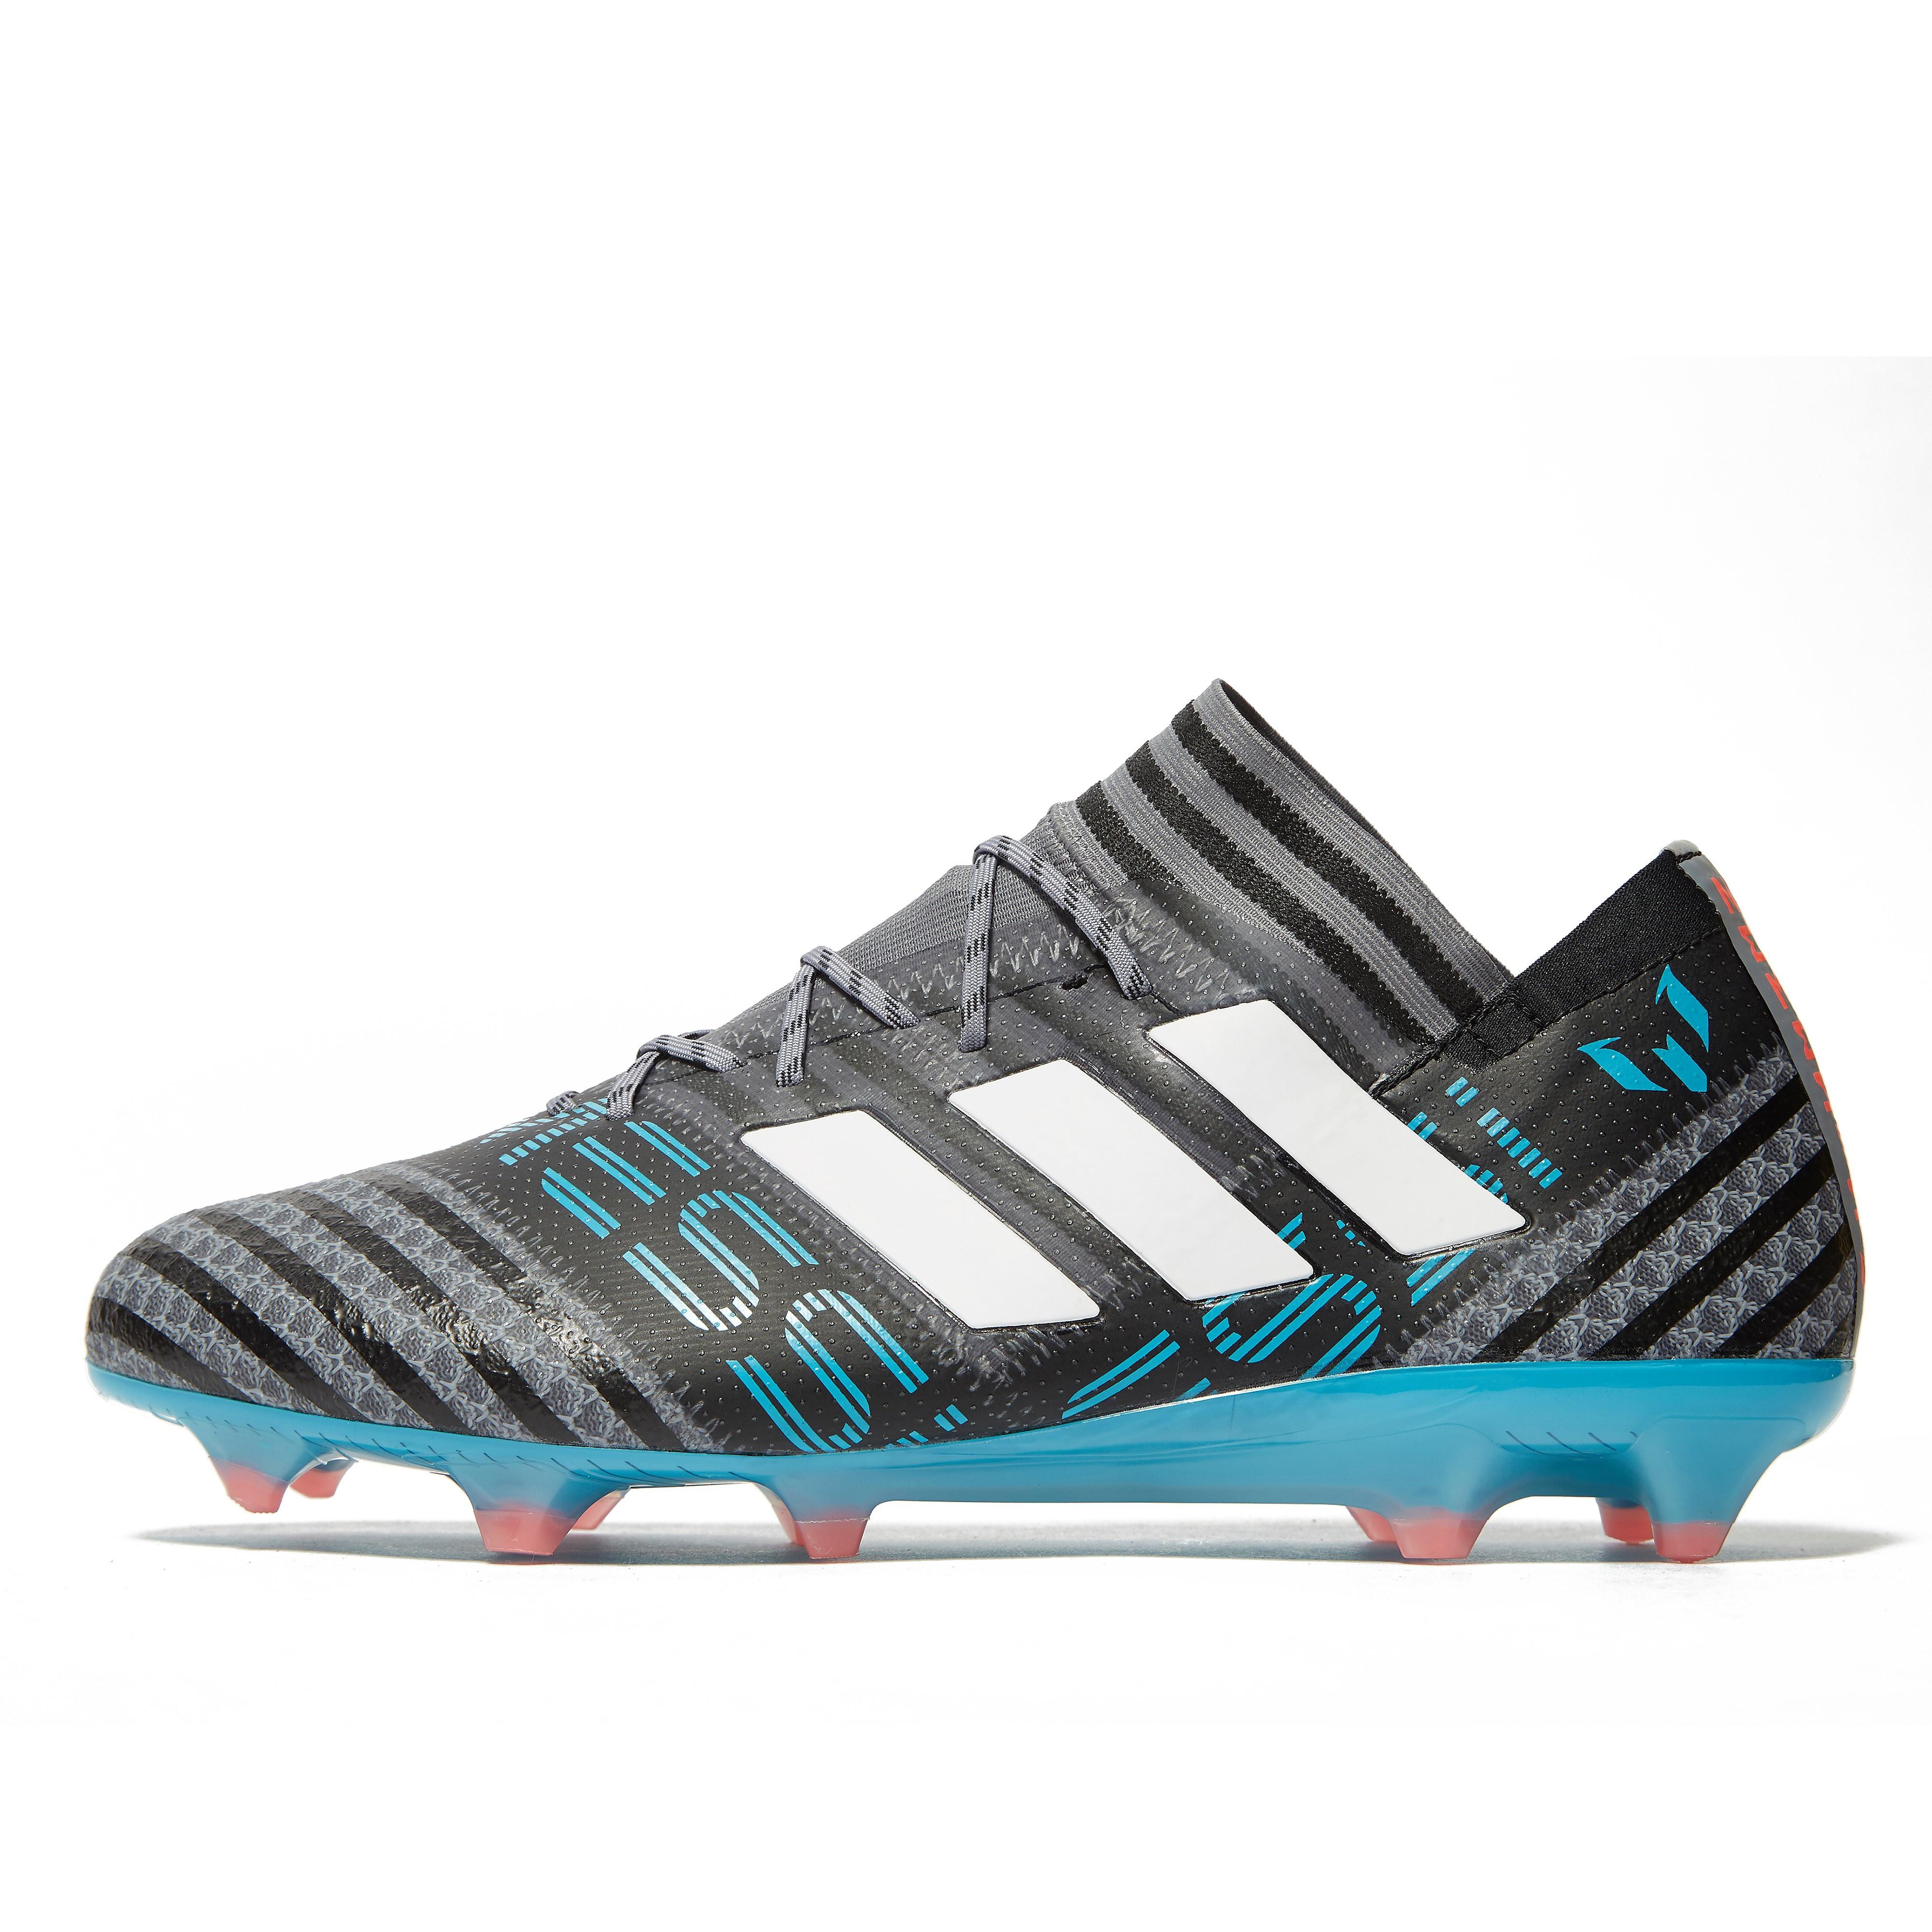 adidas Cold Blooded Nemeziz Messi 17.1 FG PRE ORDER